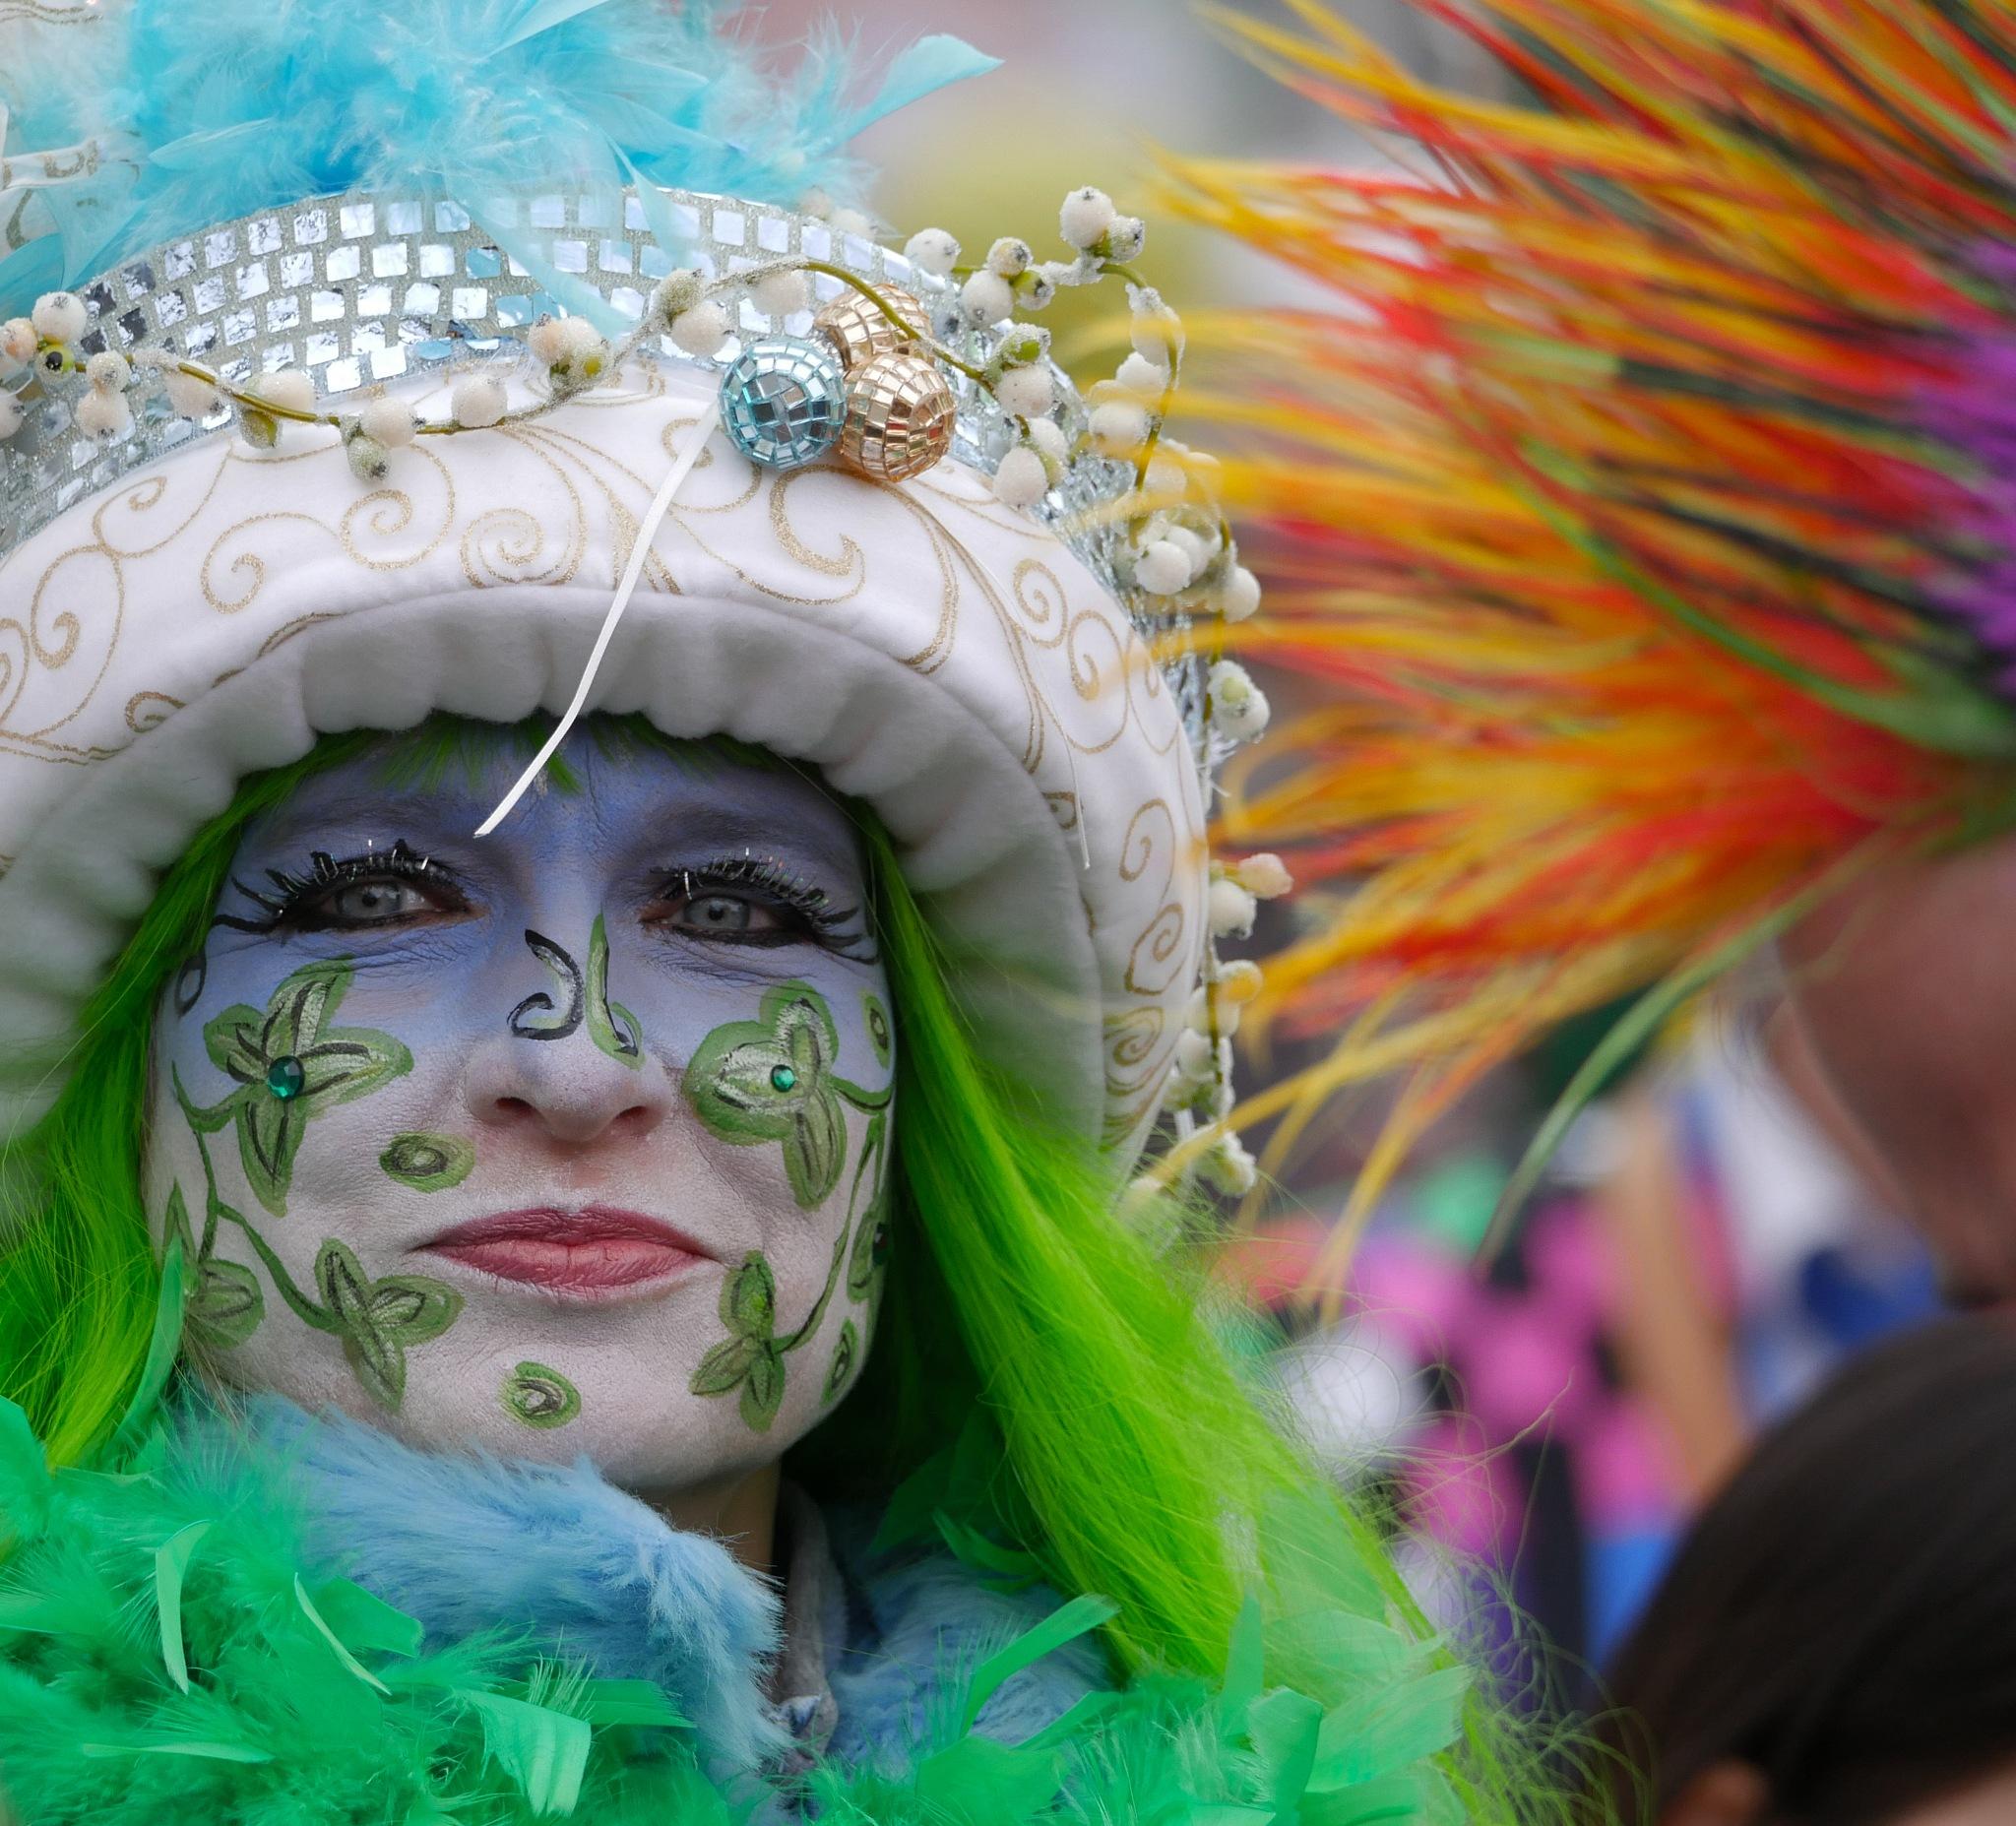 Street carnaval by StefanJansen